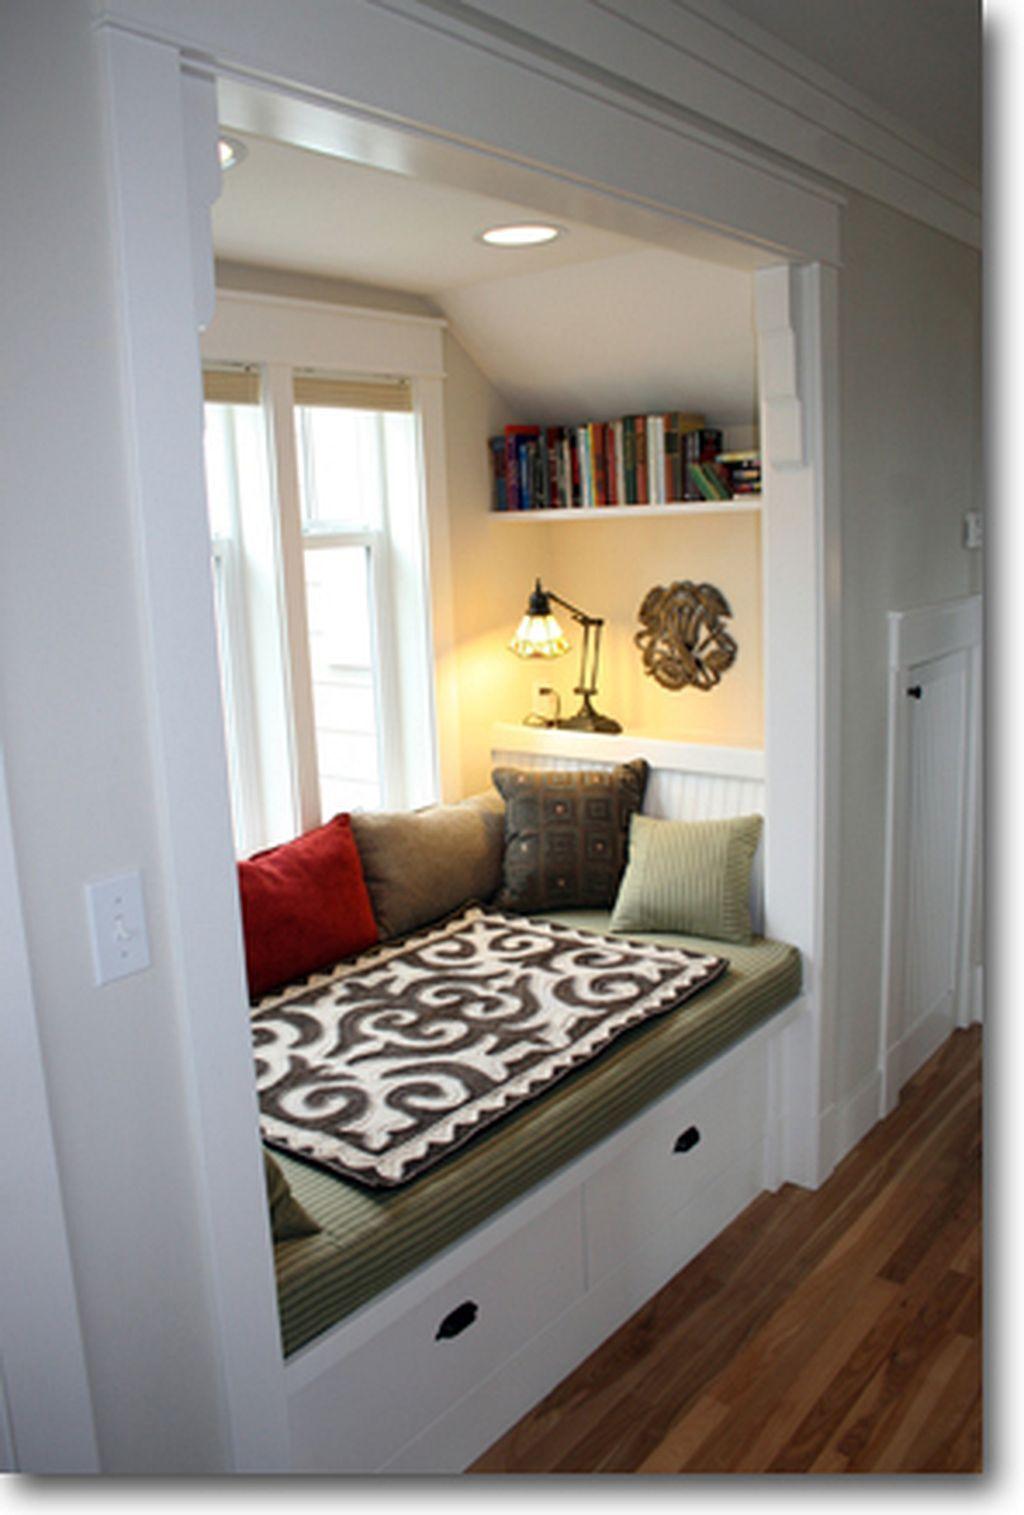 Cool 80 Cozy Reading Bay Window Ideas Https Kidmagz Com 80 Cozy Reading Bay Window Ideas Home Home Decor House Design